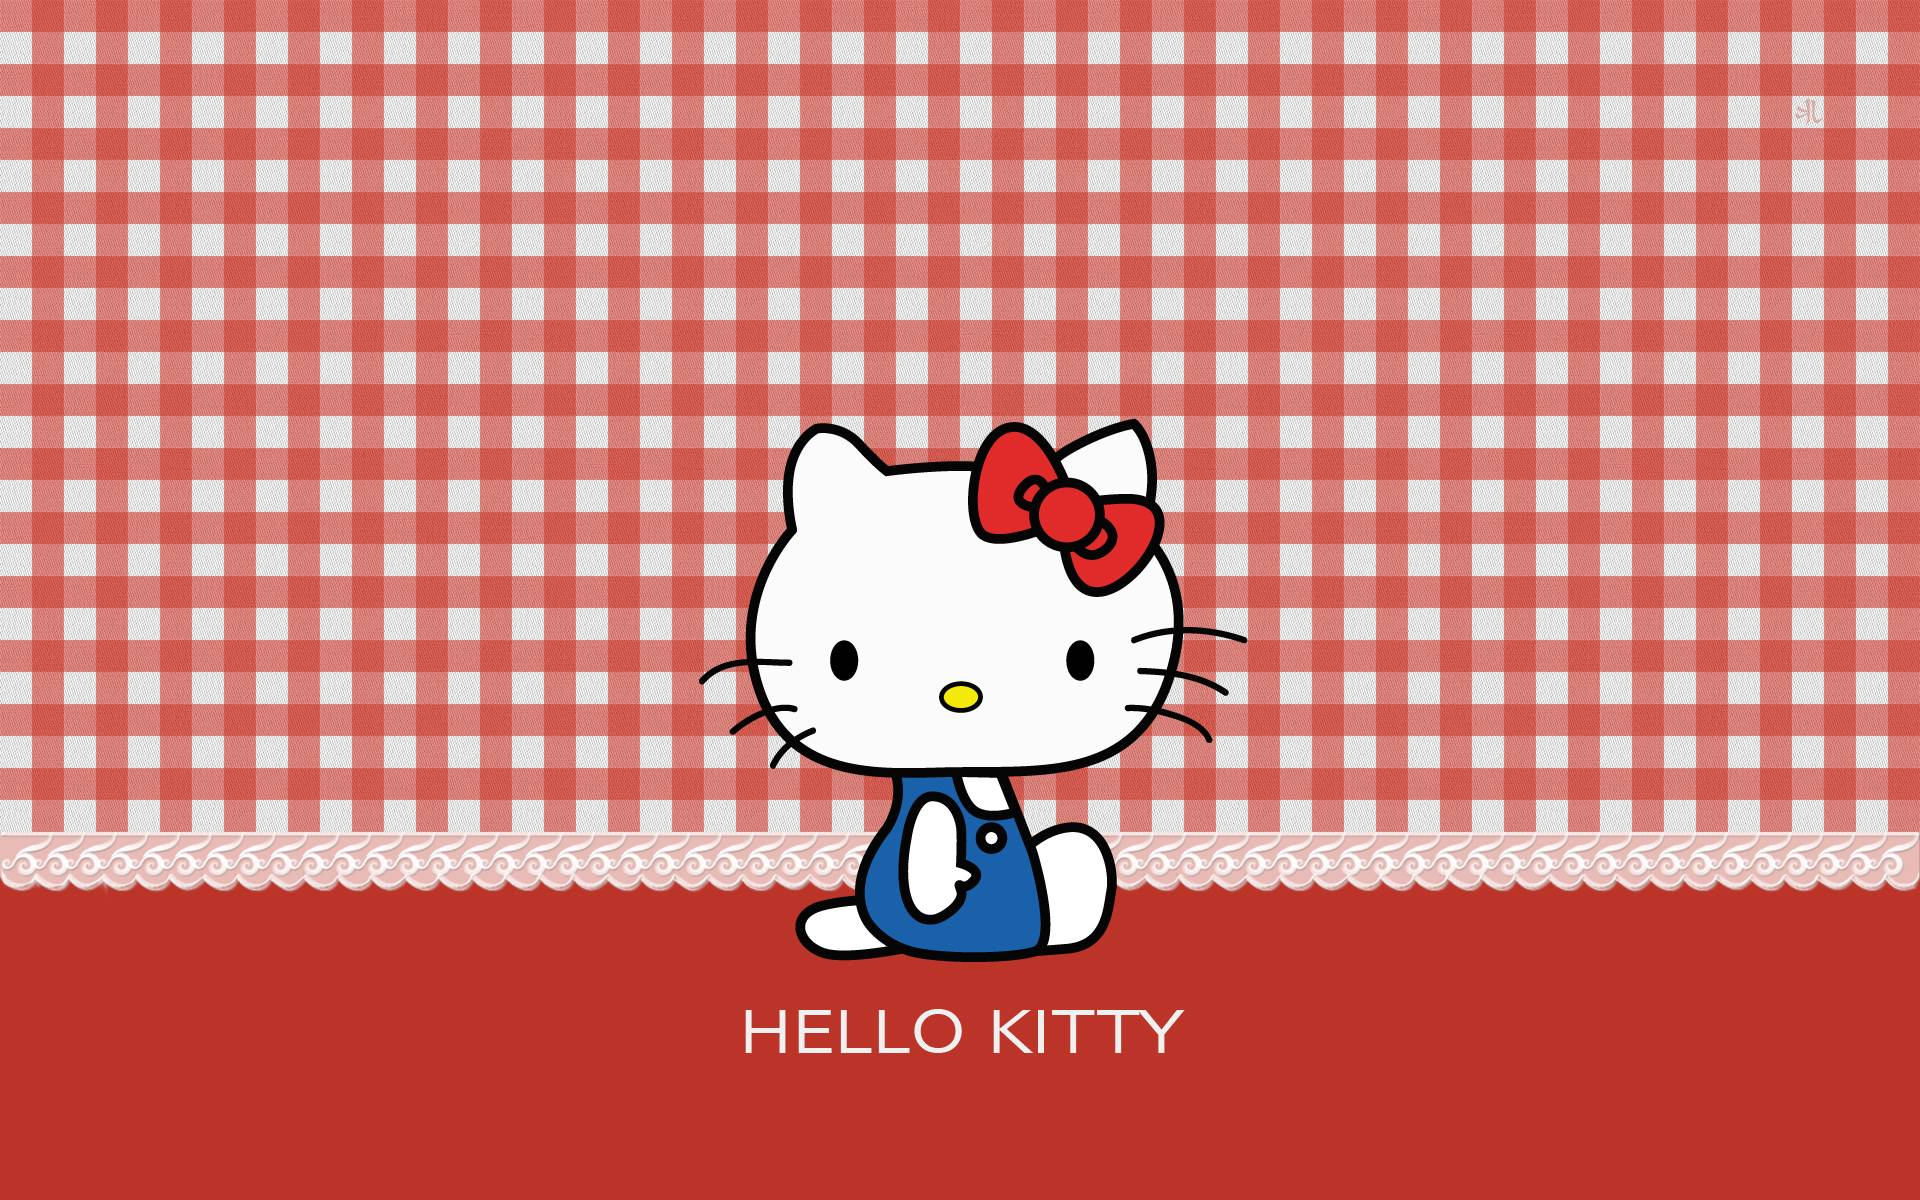 Hello Kitty Wallpapers HD